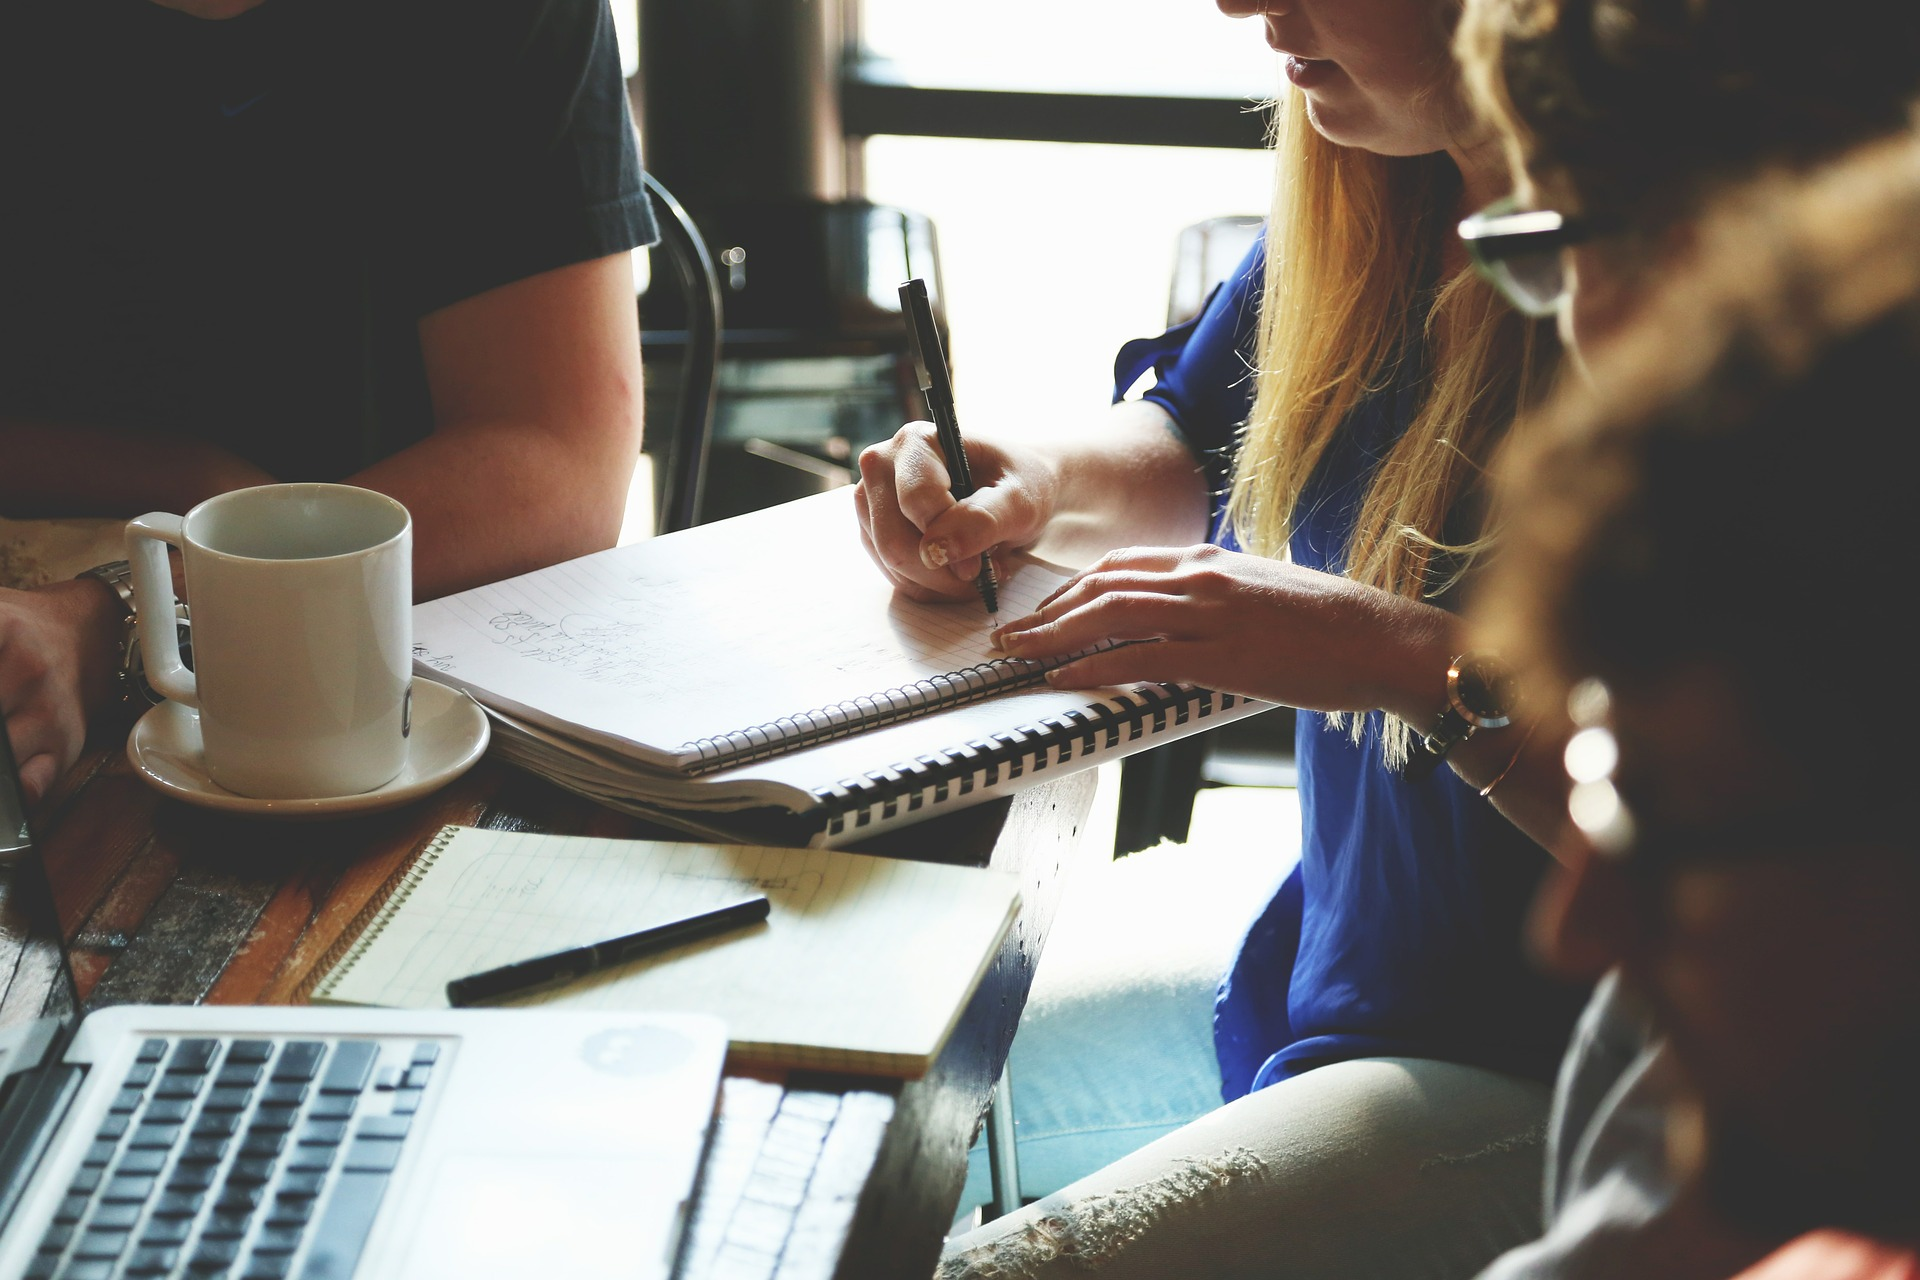 Algunos tips para renovar el catálogo de empresa